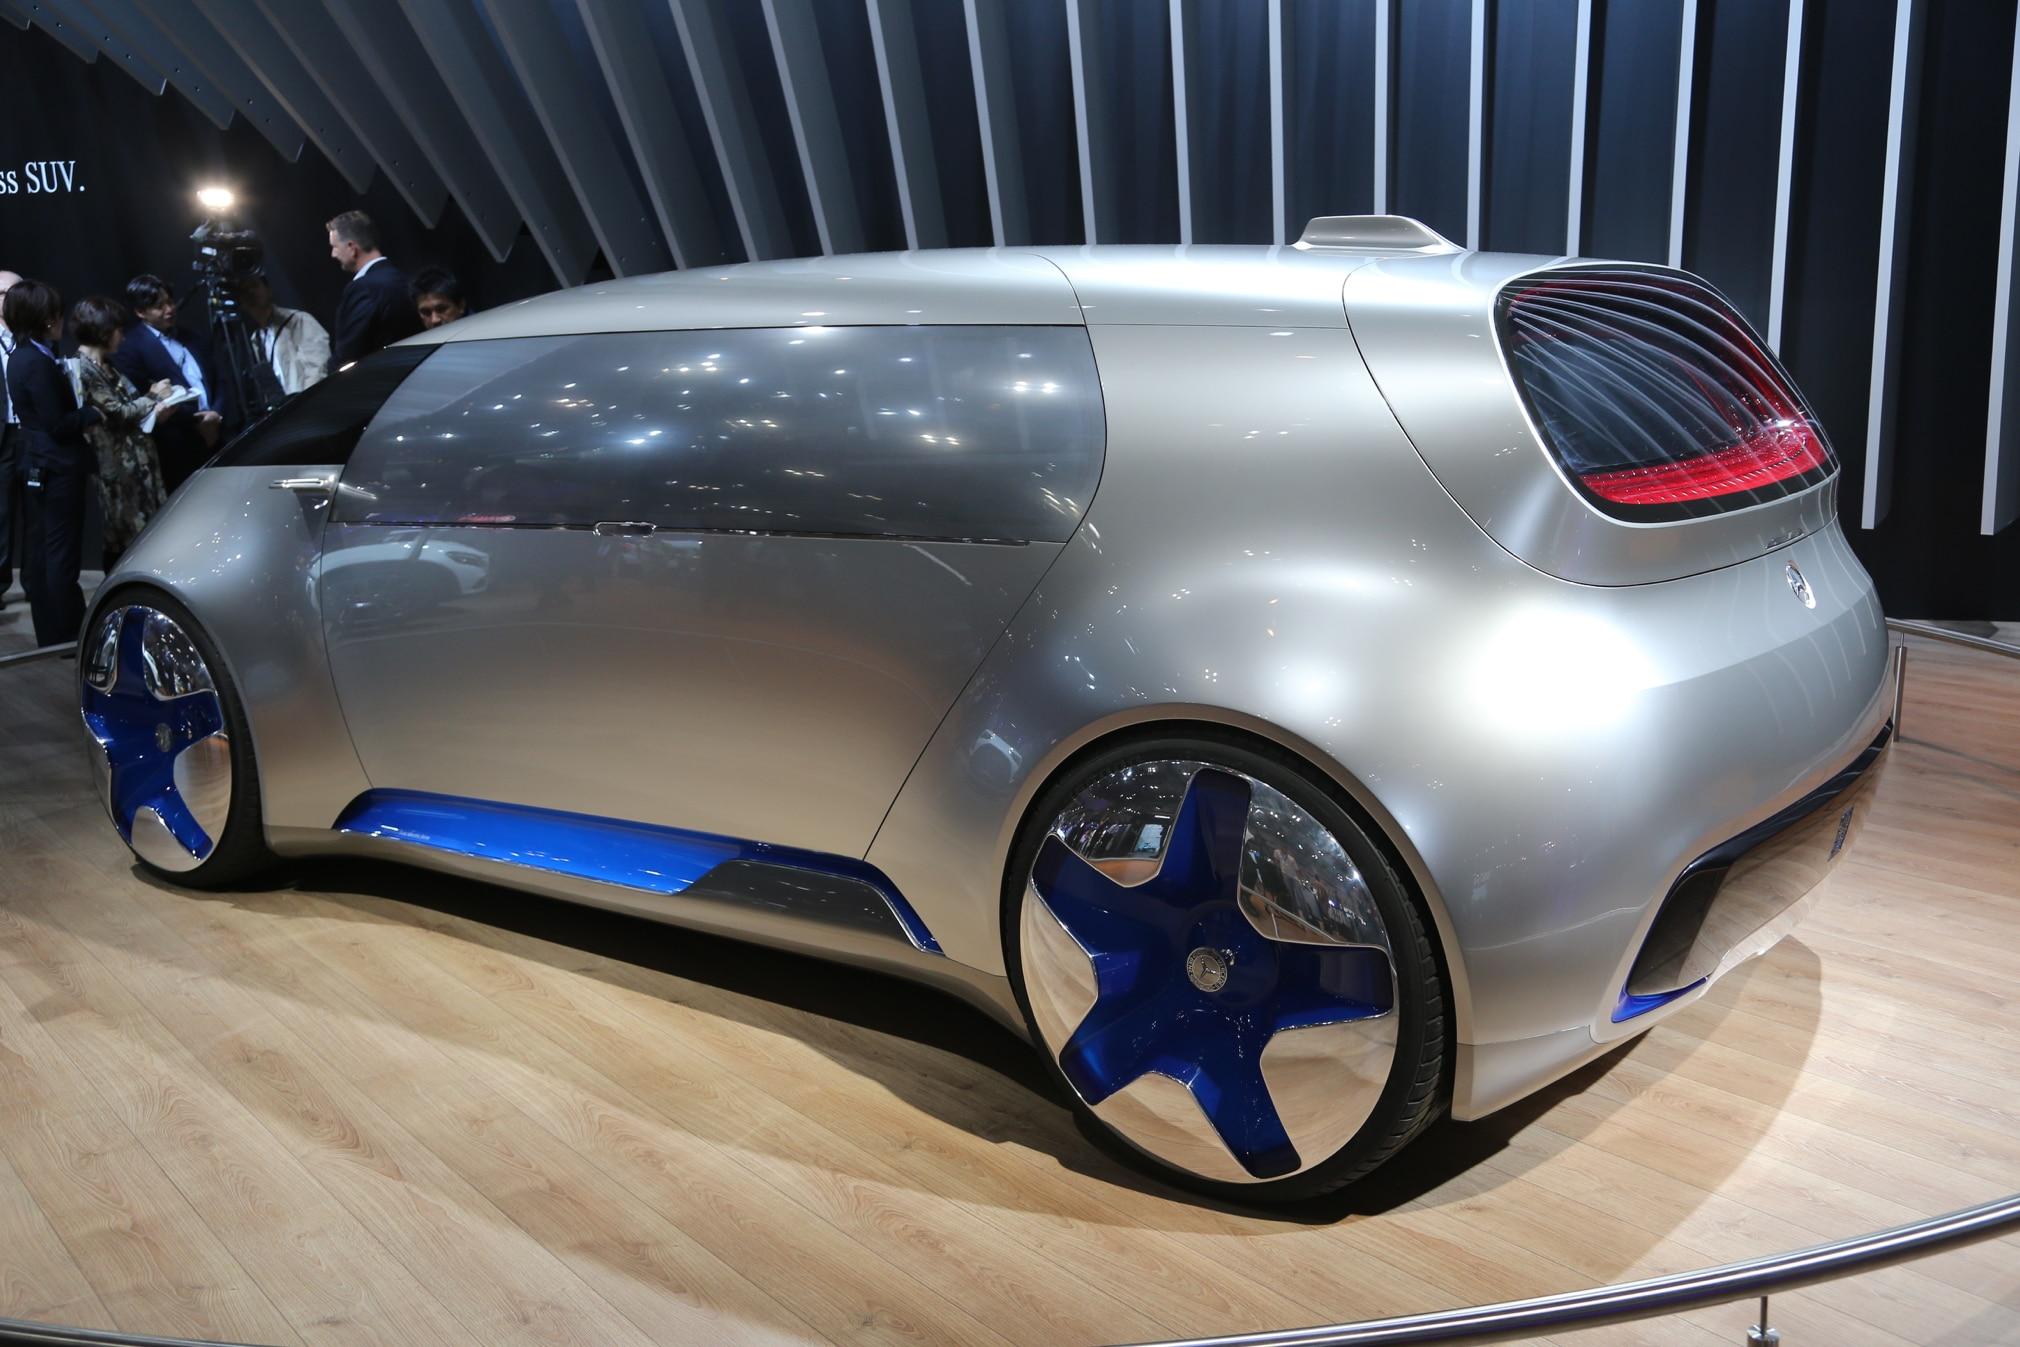 https://st.automobilemag.com/uploads/sites/11/2015/10/Mercedes-Benz-Vision-Tokyo-Concept-rear-three-quarter.jpg